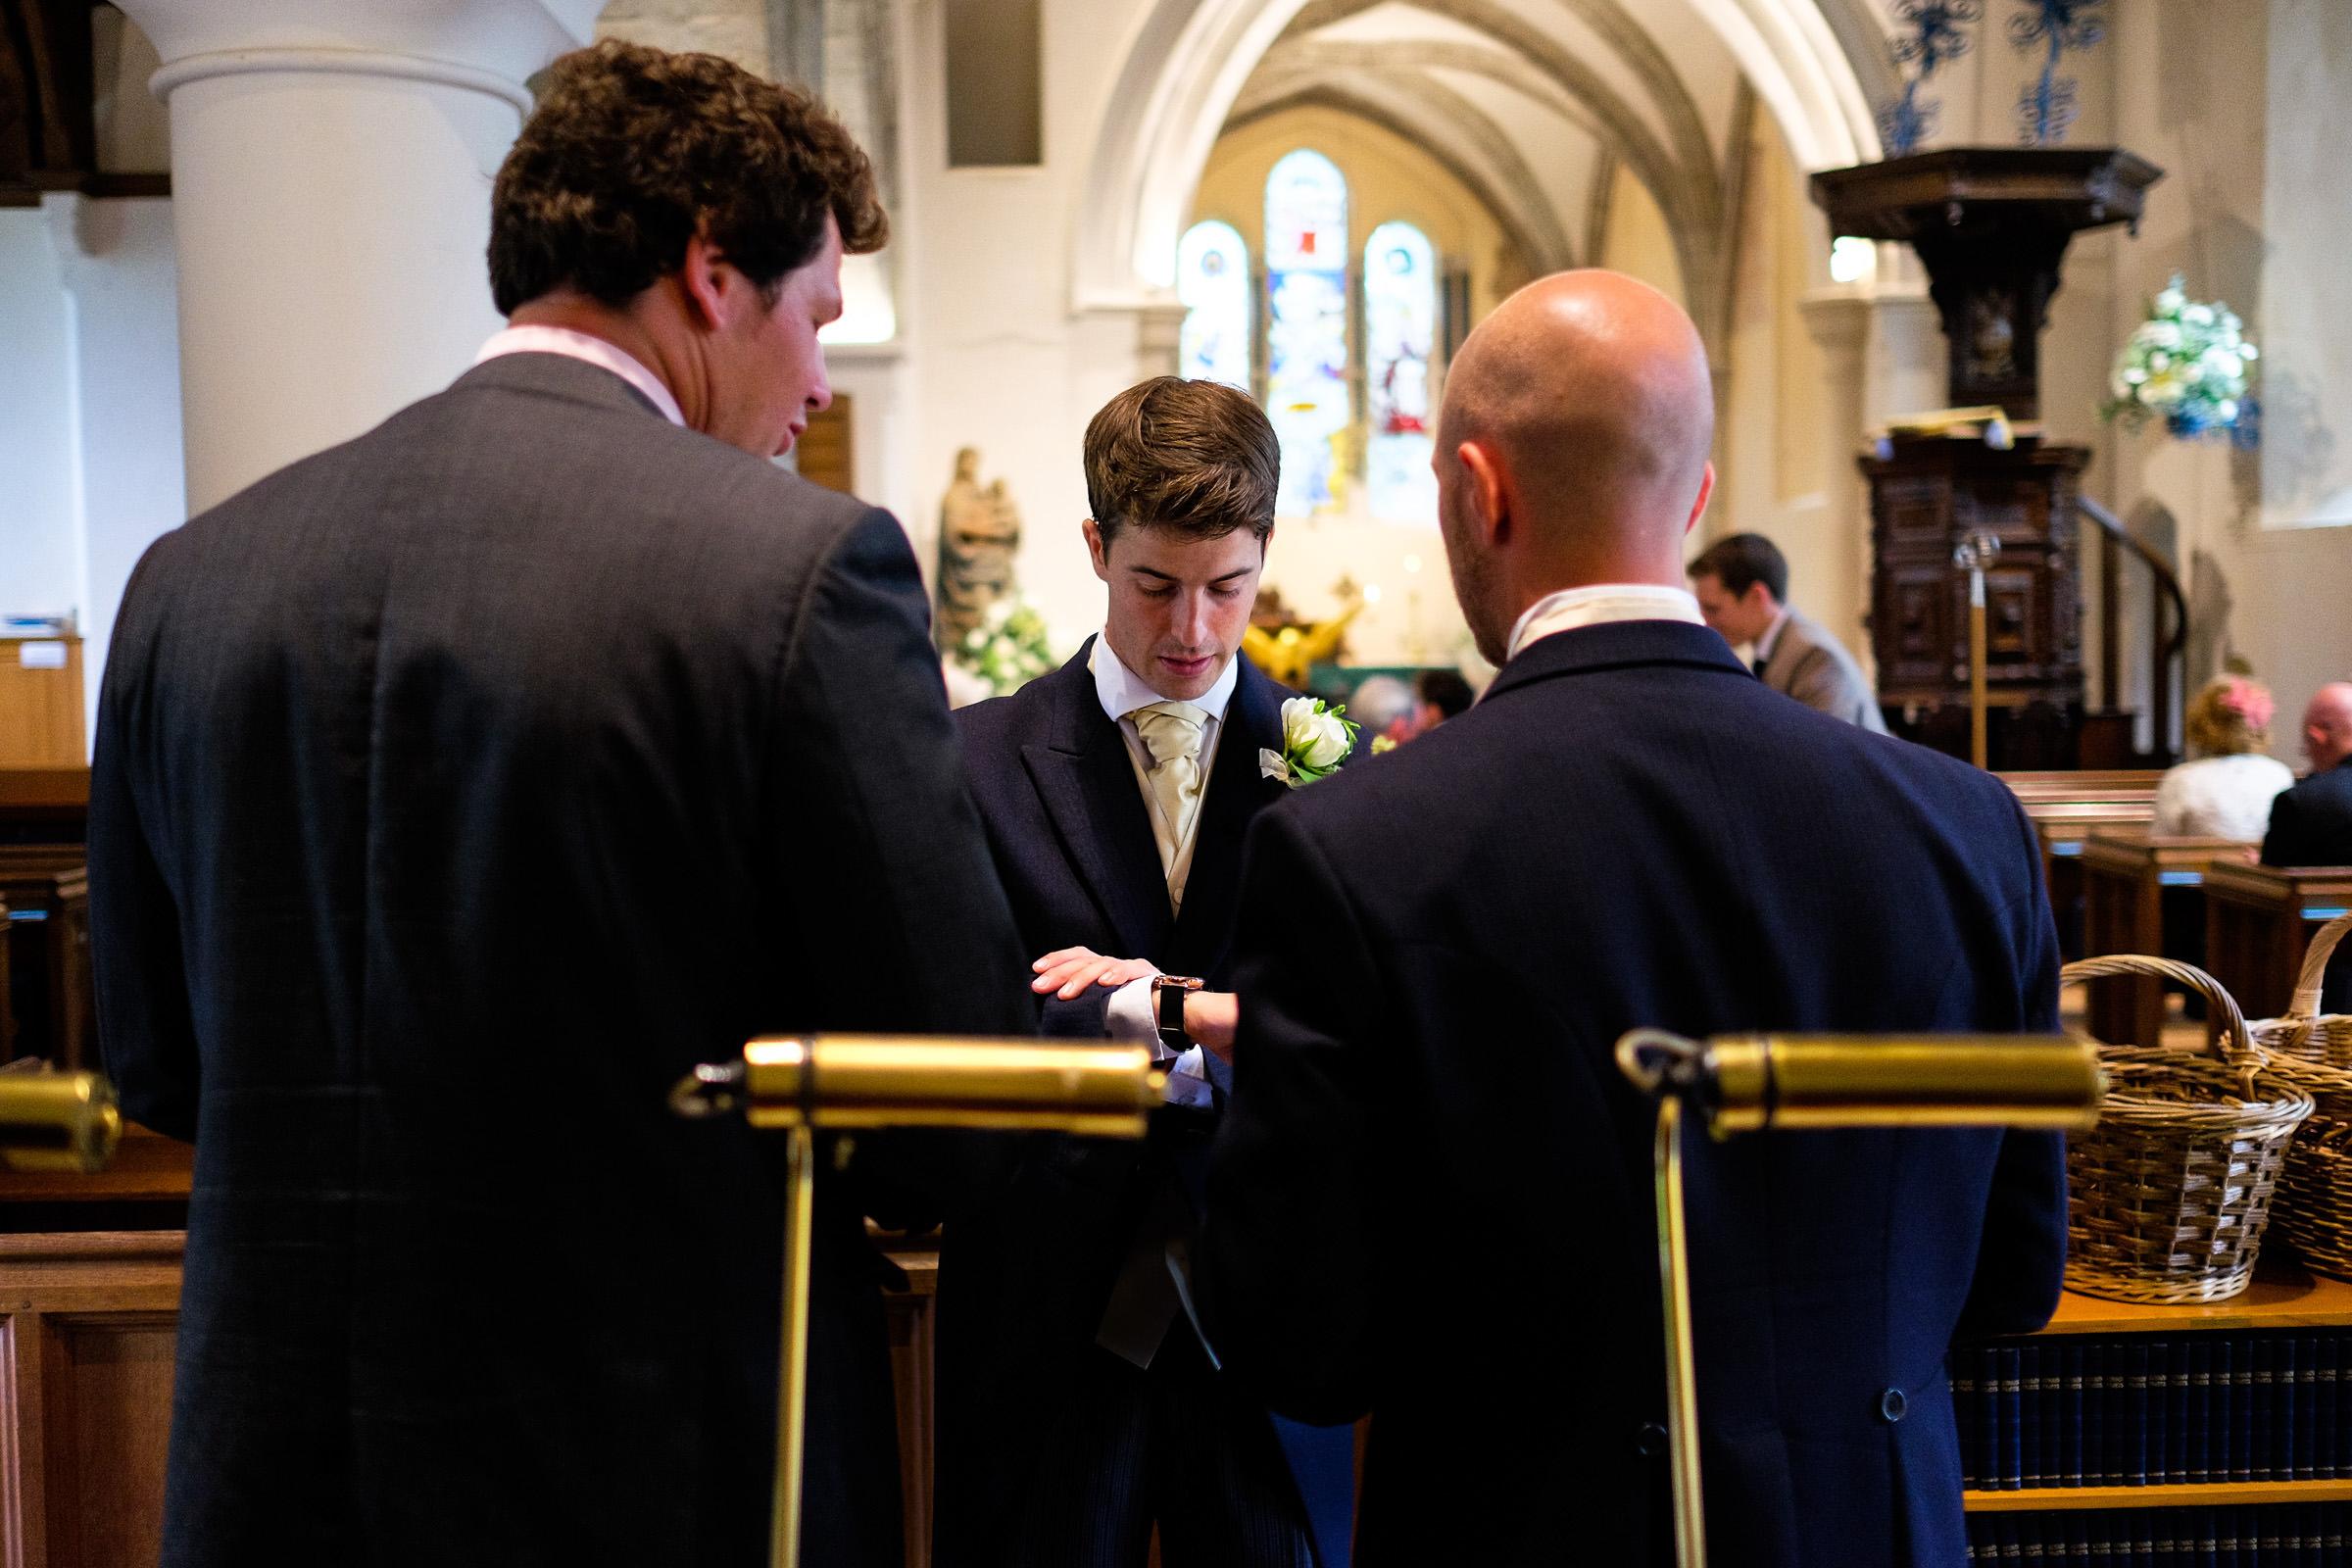 Wedding at Parkside School in Surrey 010.jpg